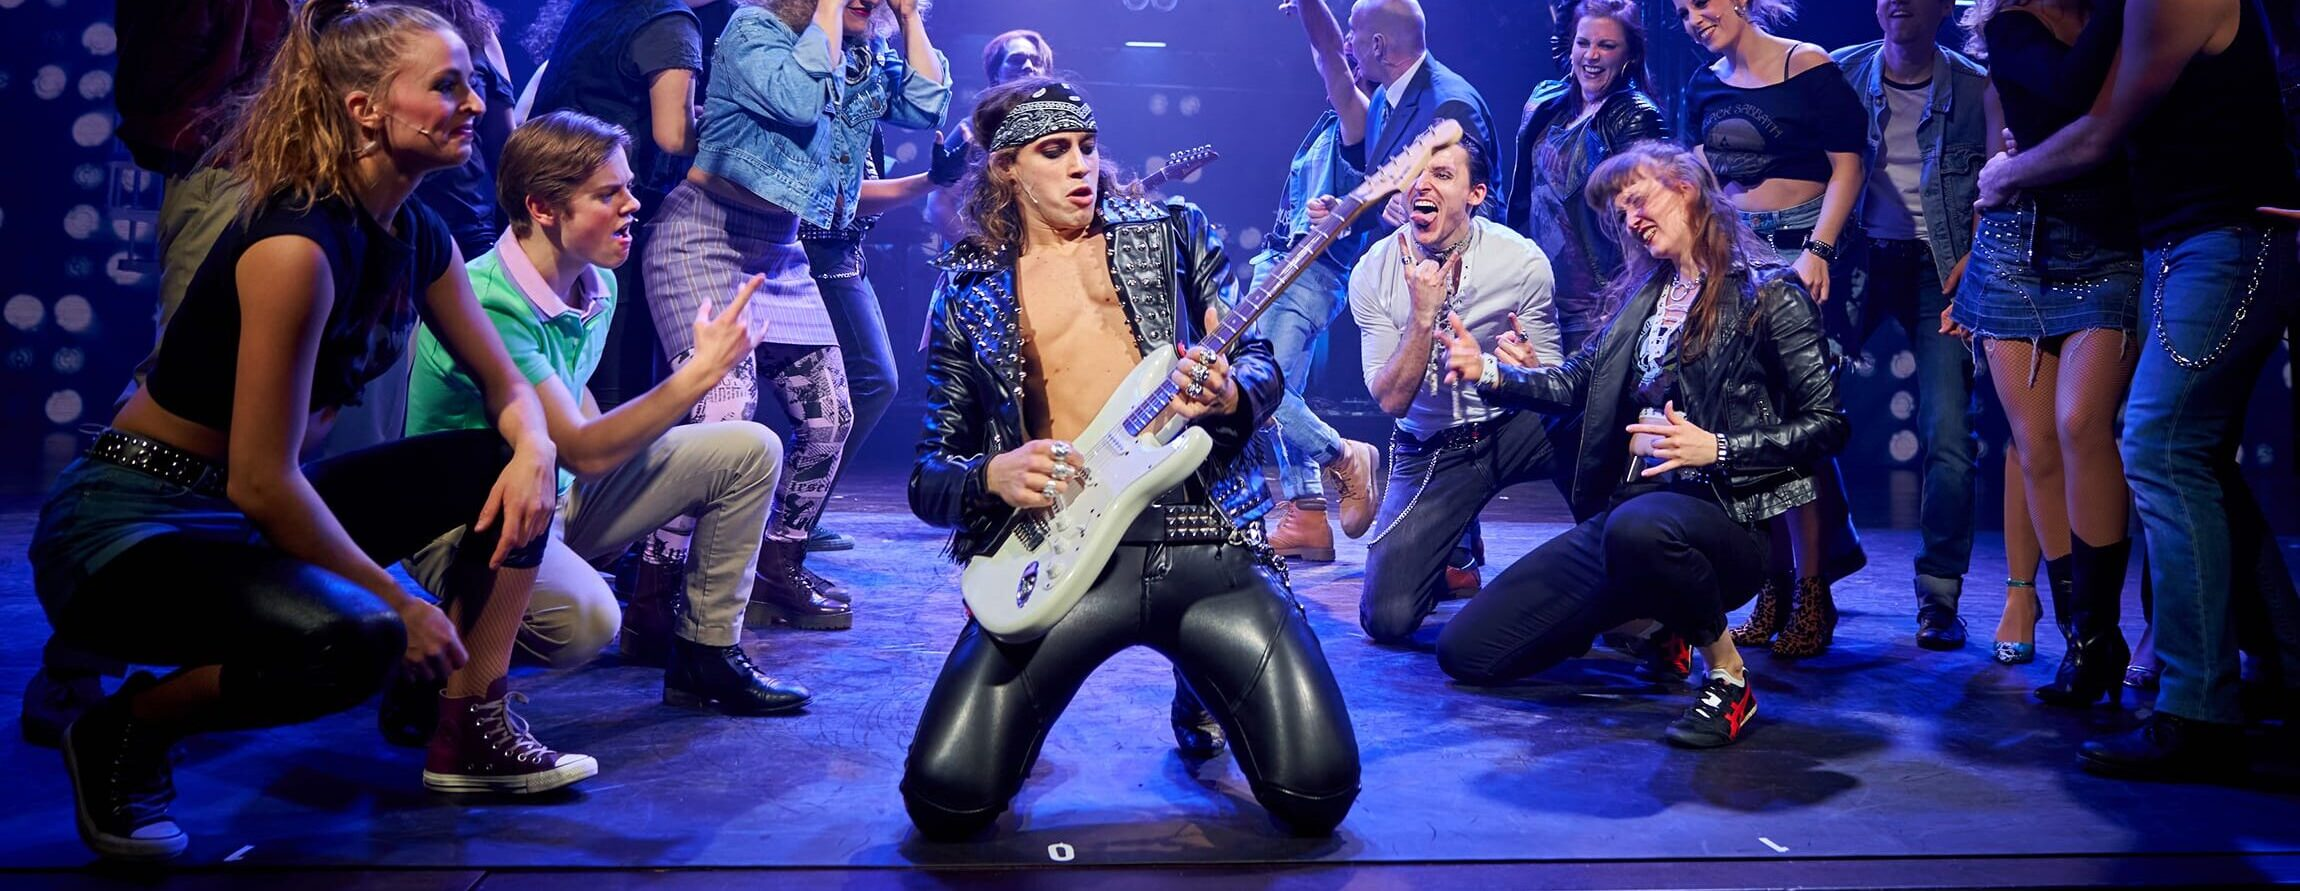 Musicalaufführung Rock of Ages vom Le Théâtre Emmen